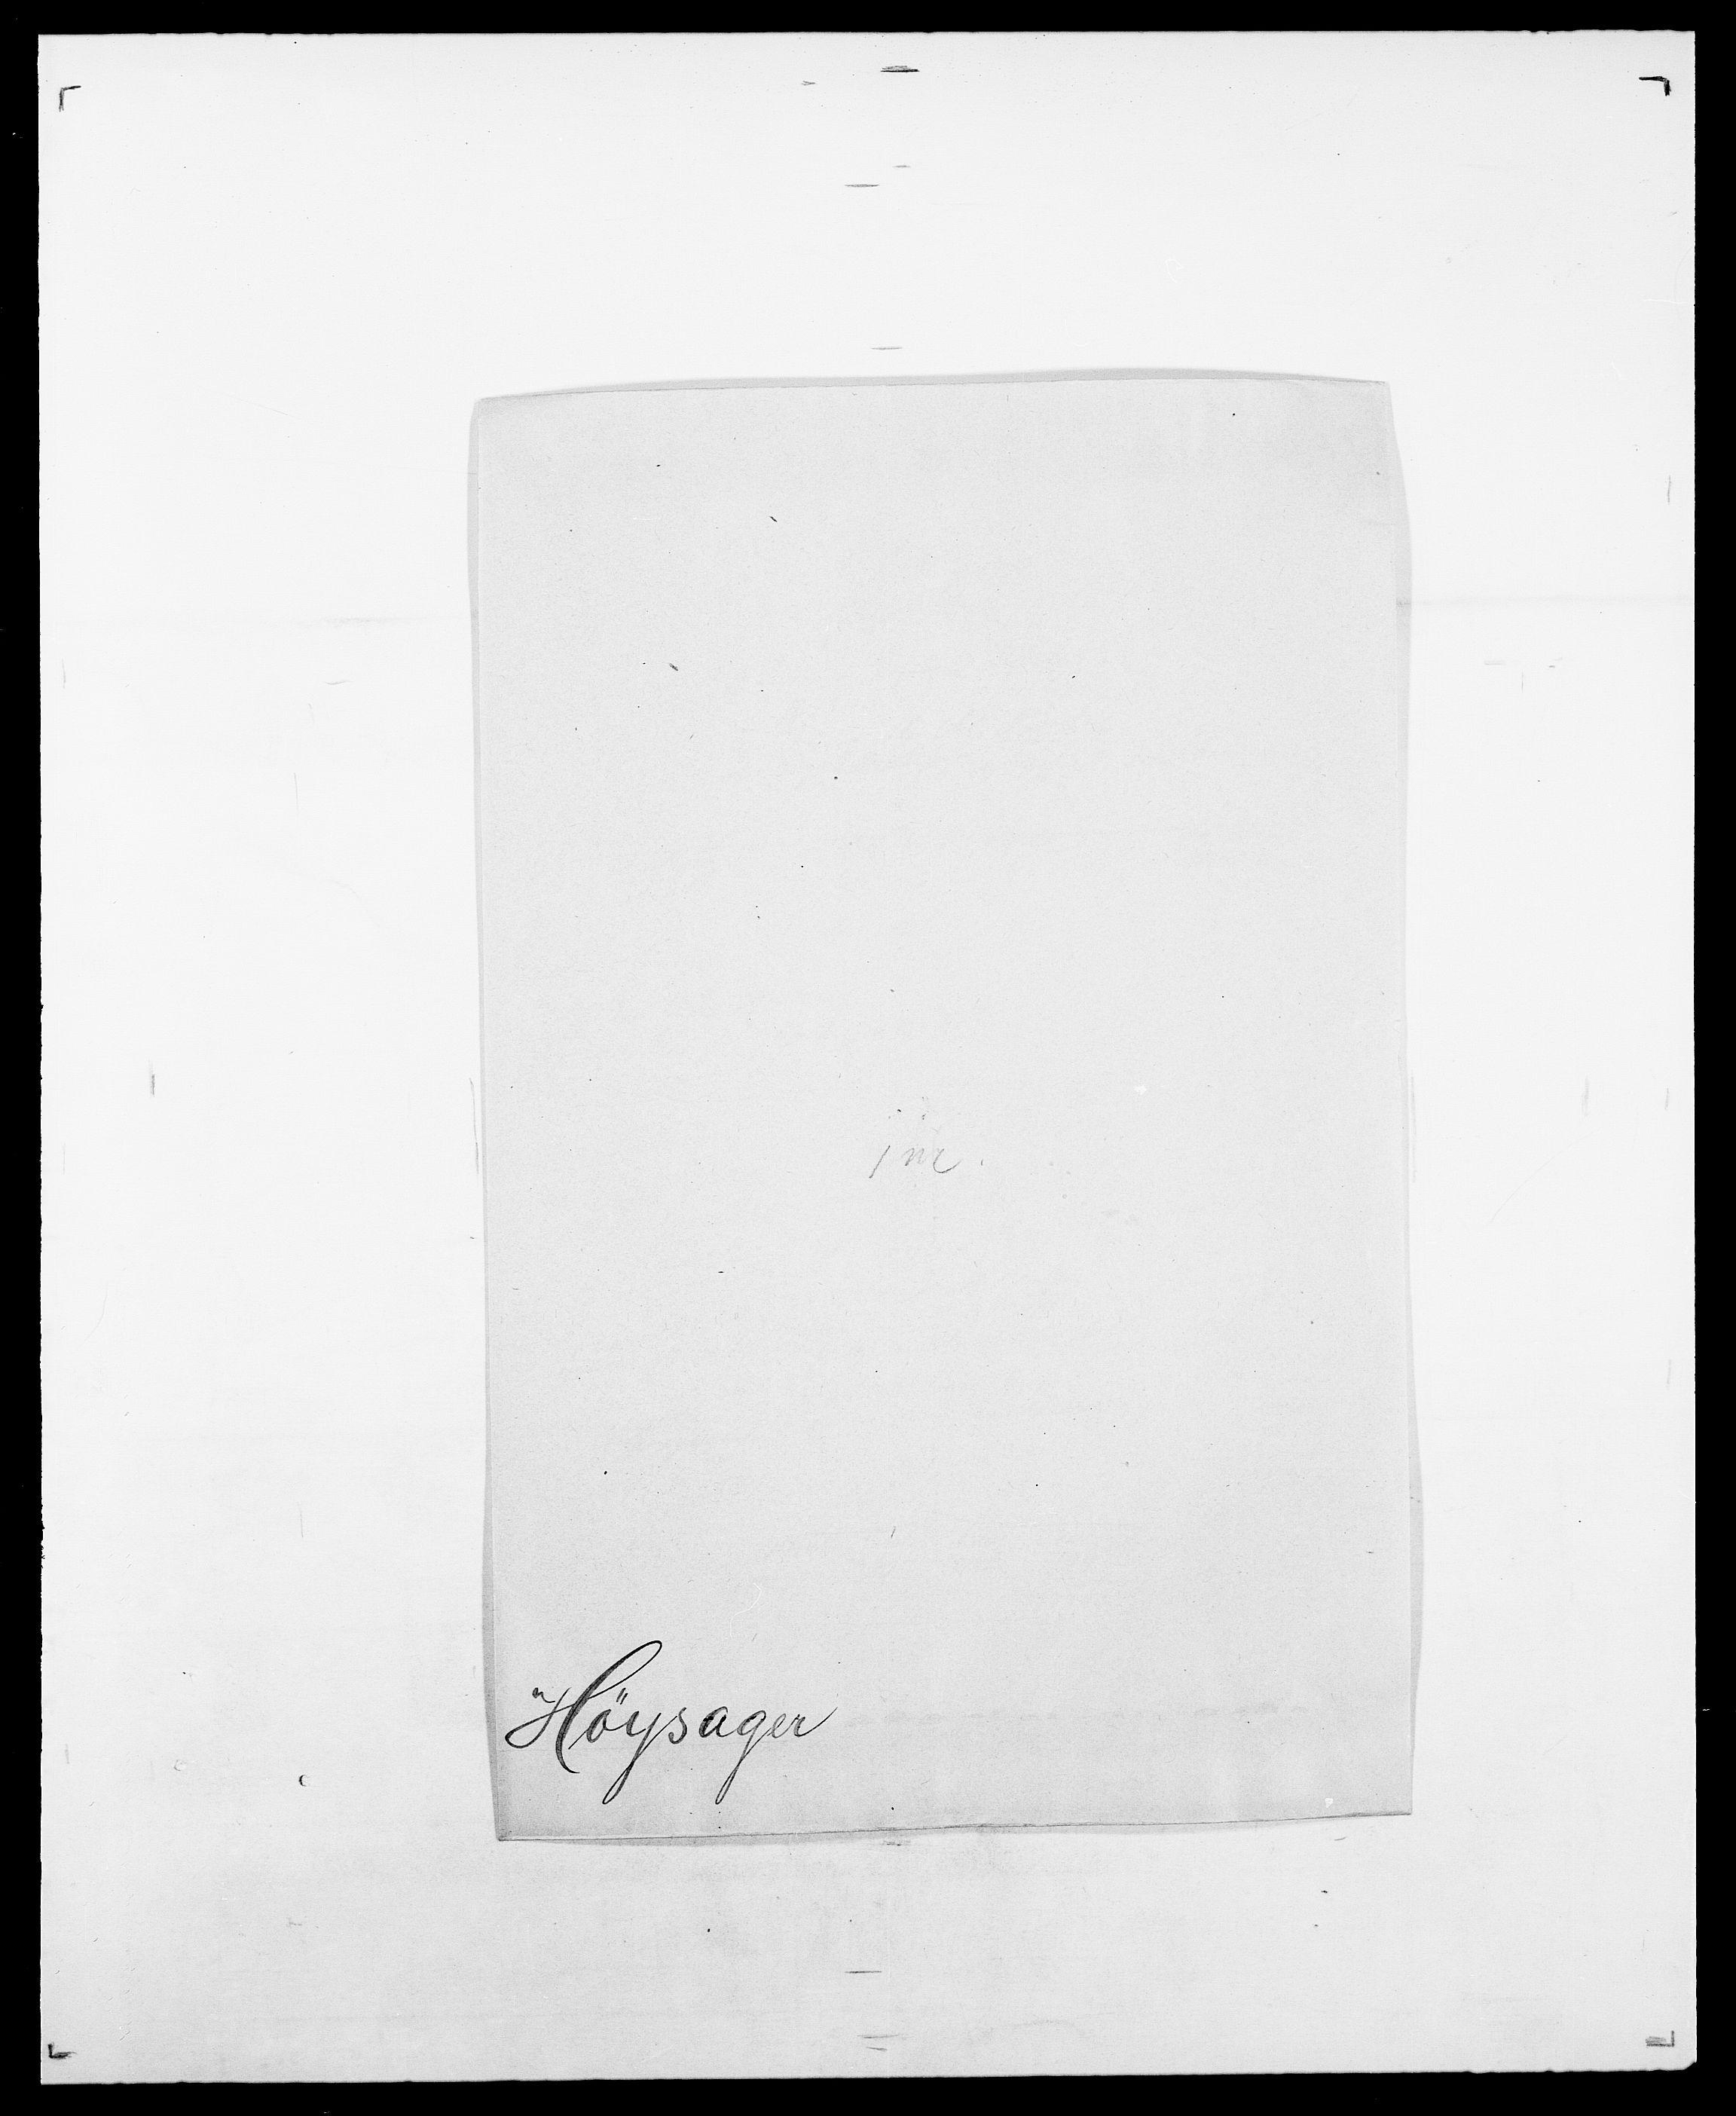 SAO, Delgobe, Charles Antoine - samling, D/Da/L0019: van der Hude - Joys, s. 465